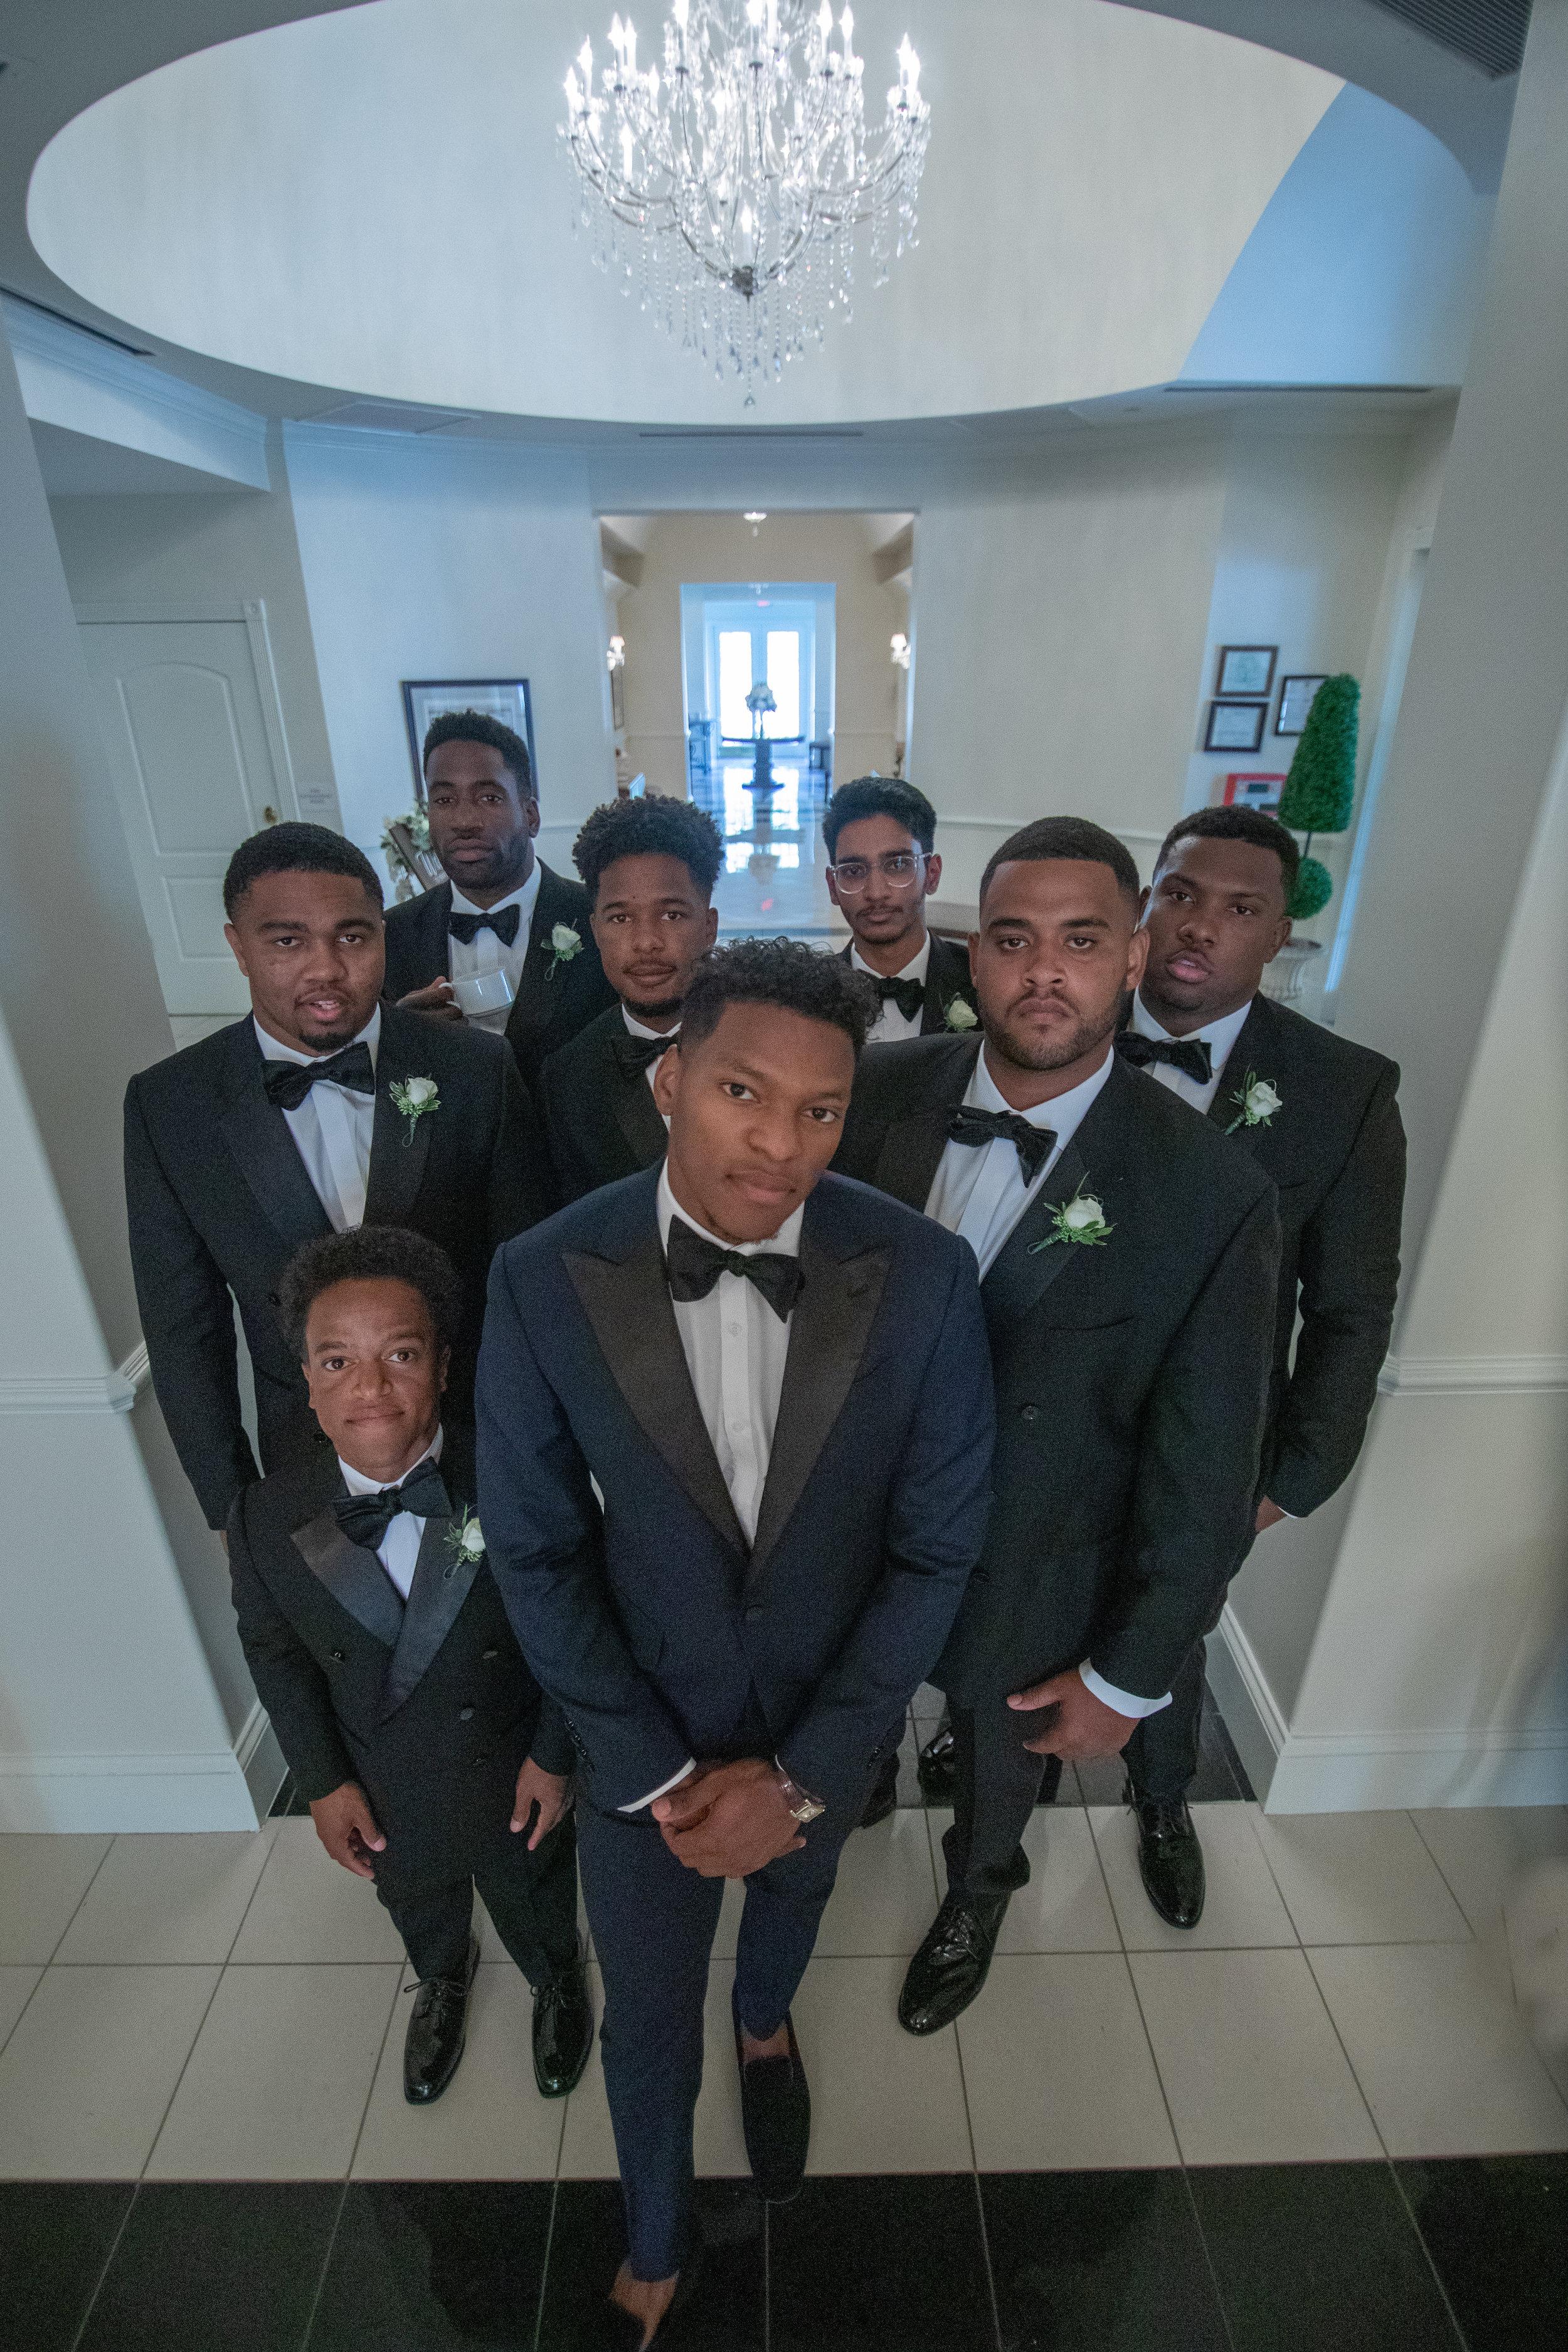 Groom with his groomsmen photo by the Atlanta wedding photographers at AtlantaArtisticWeddings